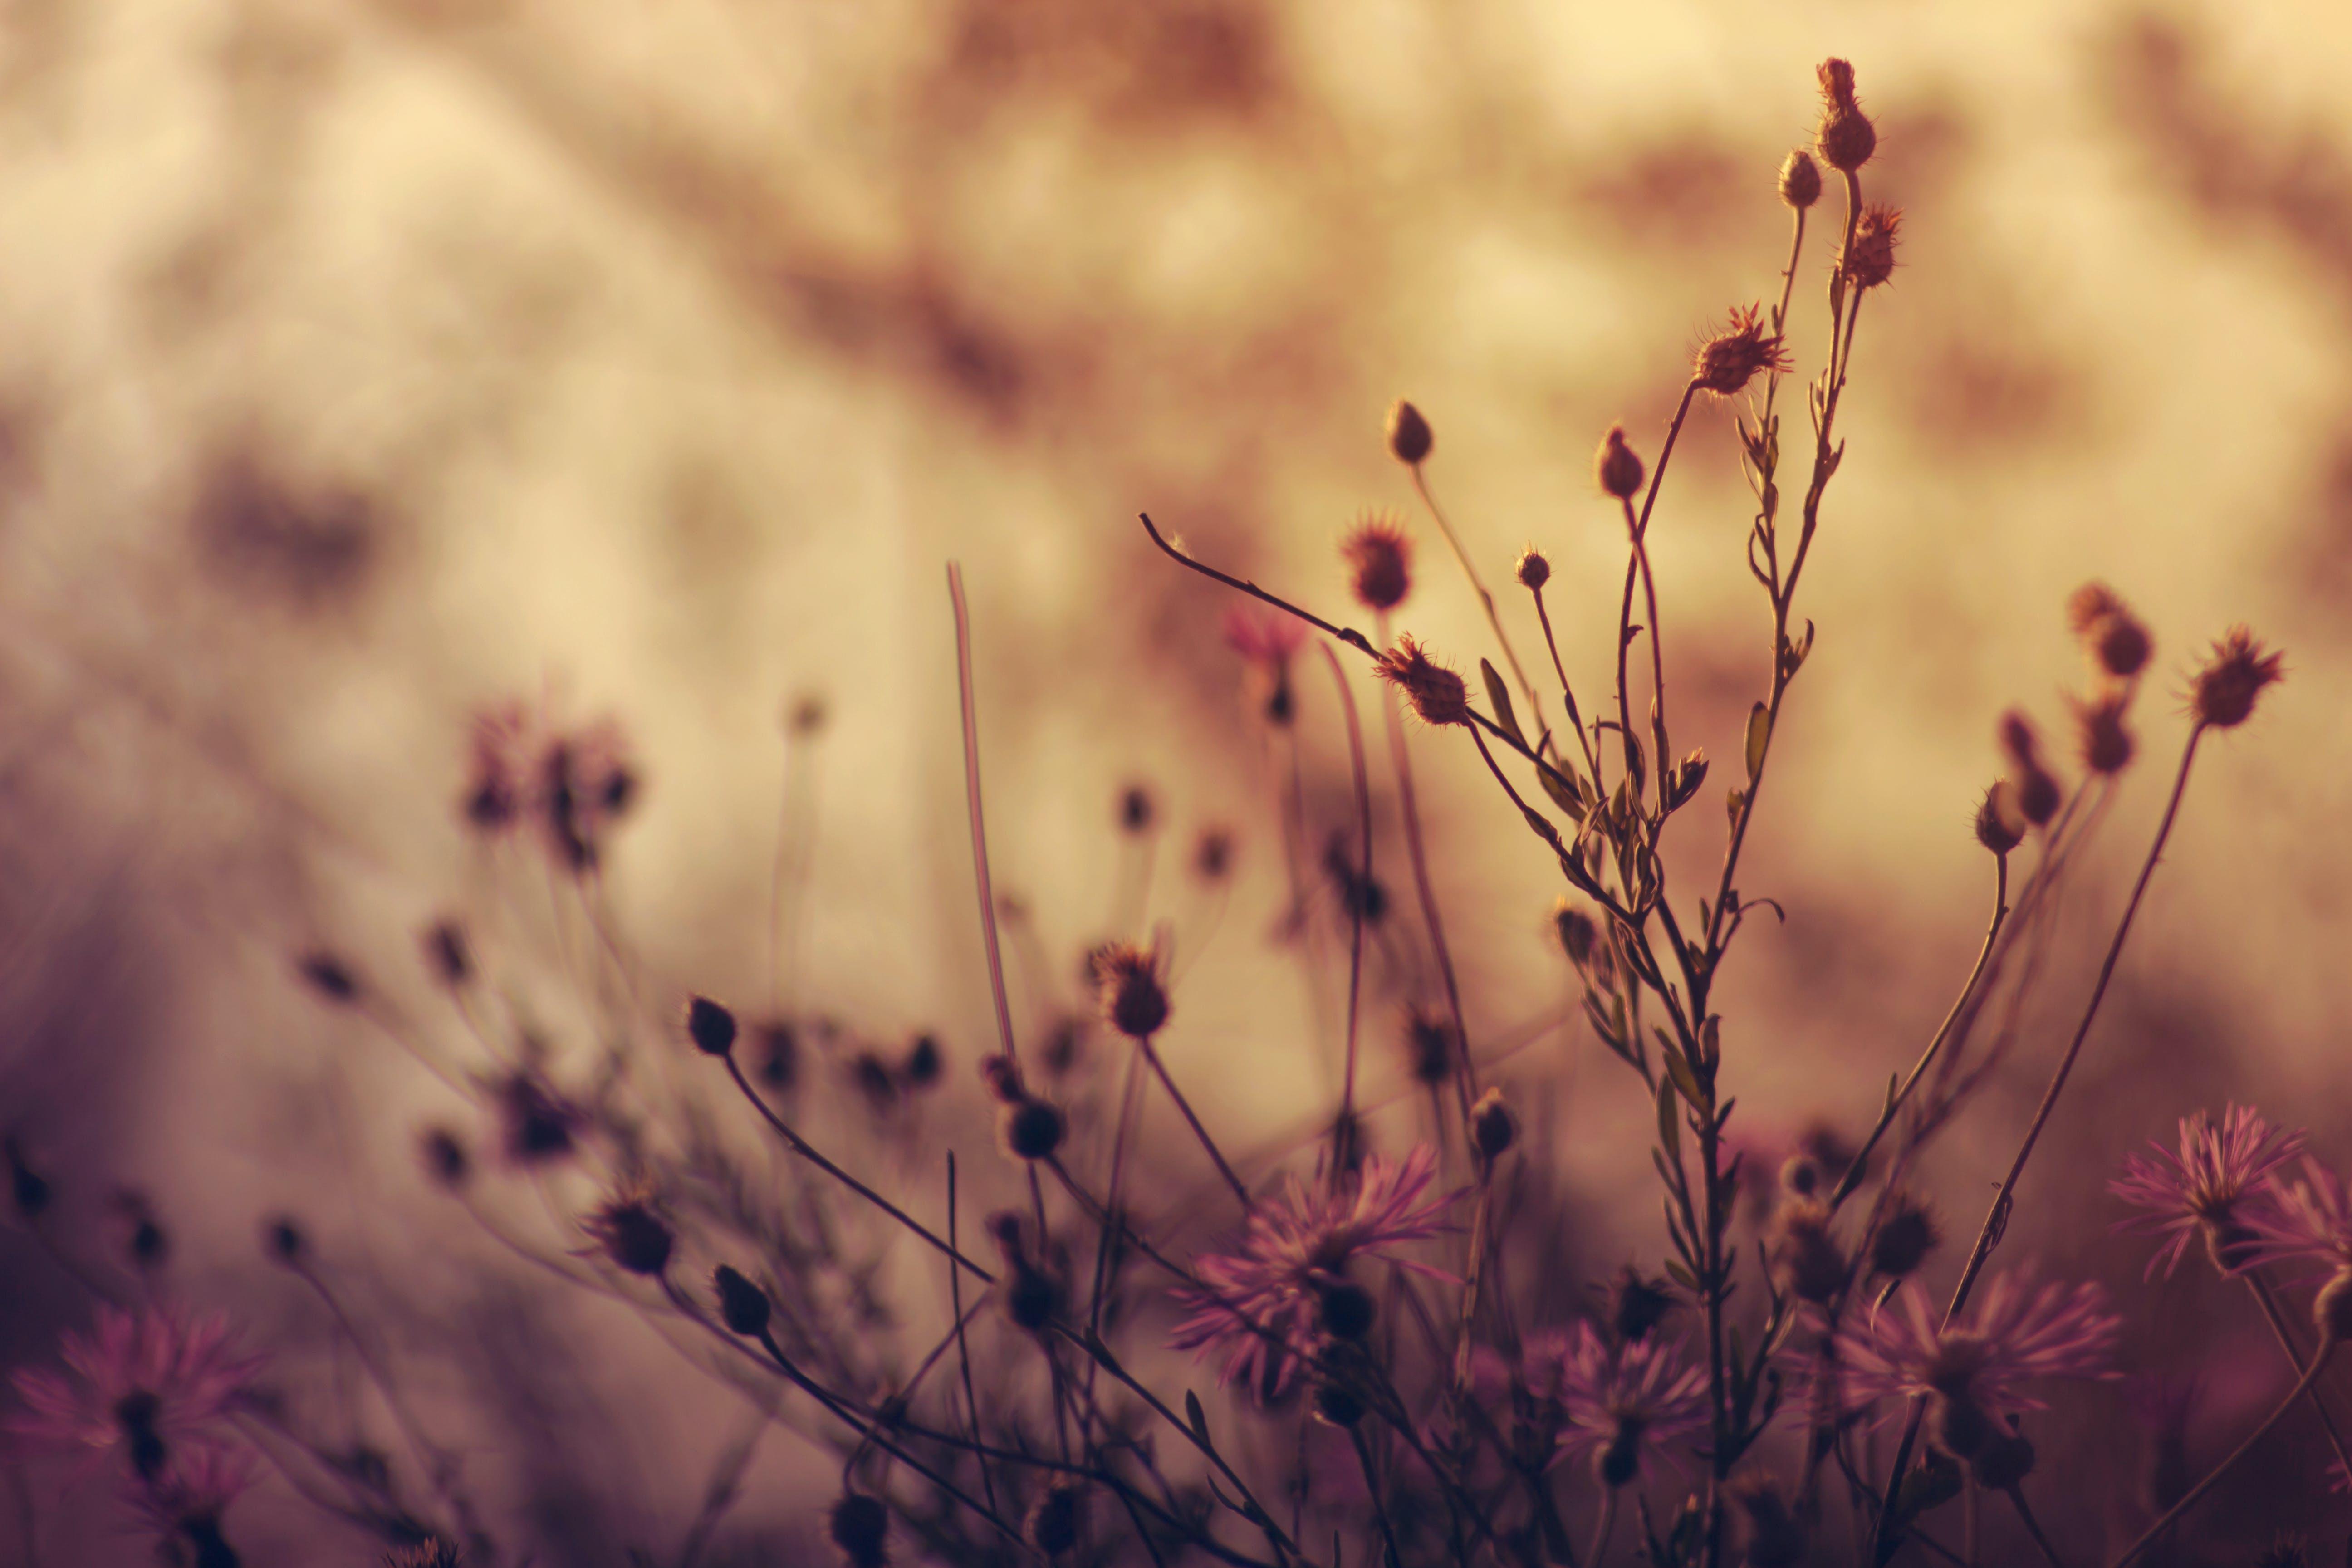 Plants Shallow Focus Photography